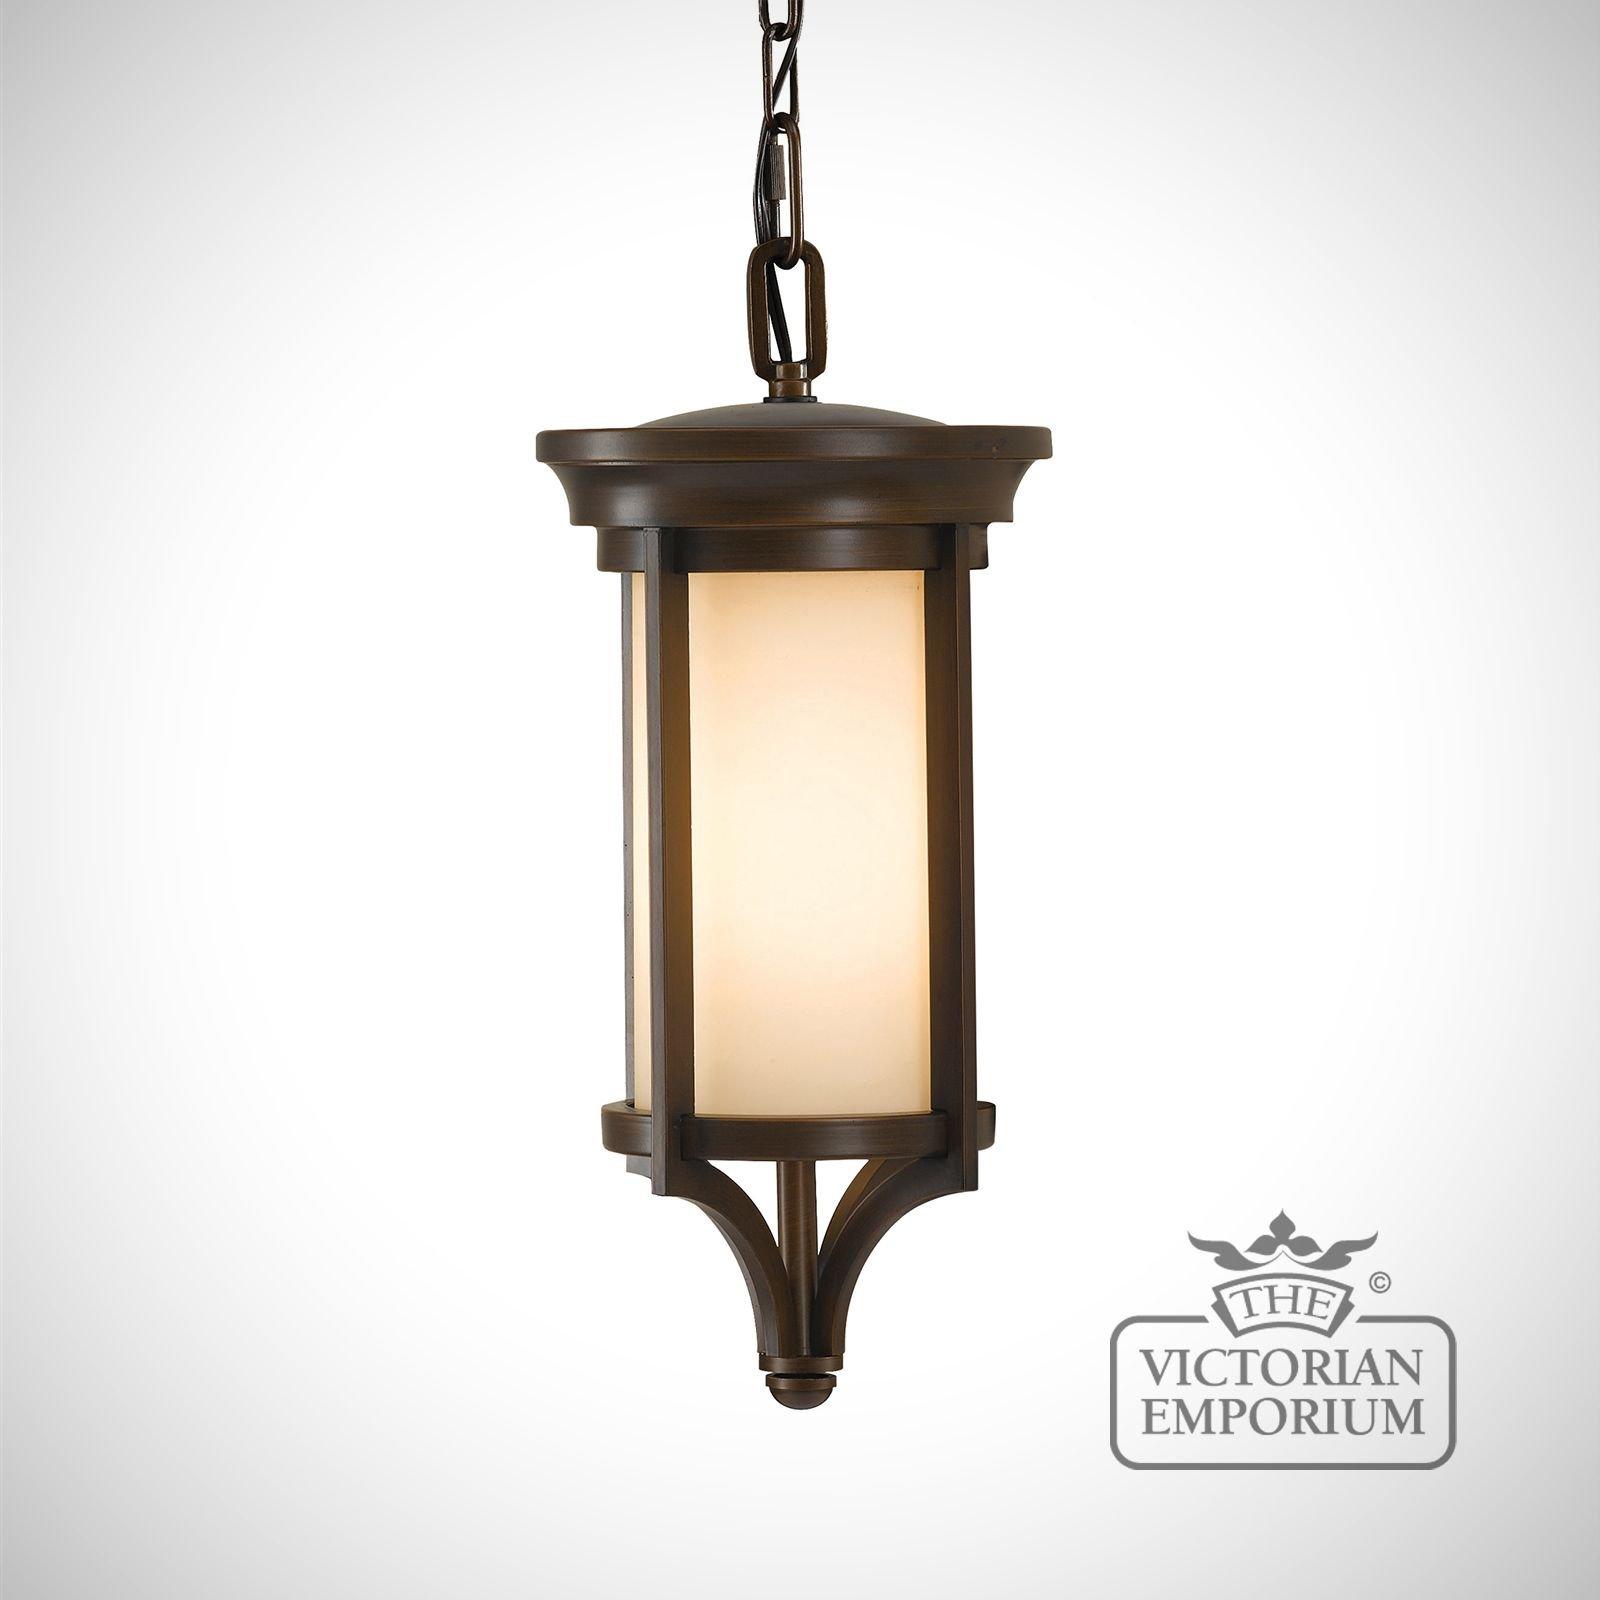 Merrell Chain Lantern The Victorian Emporium